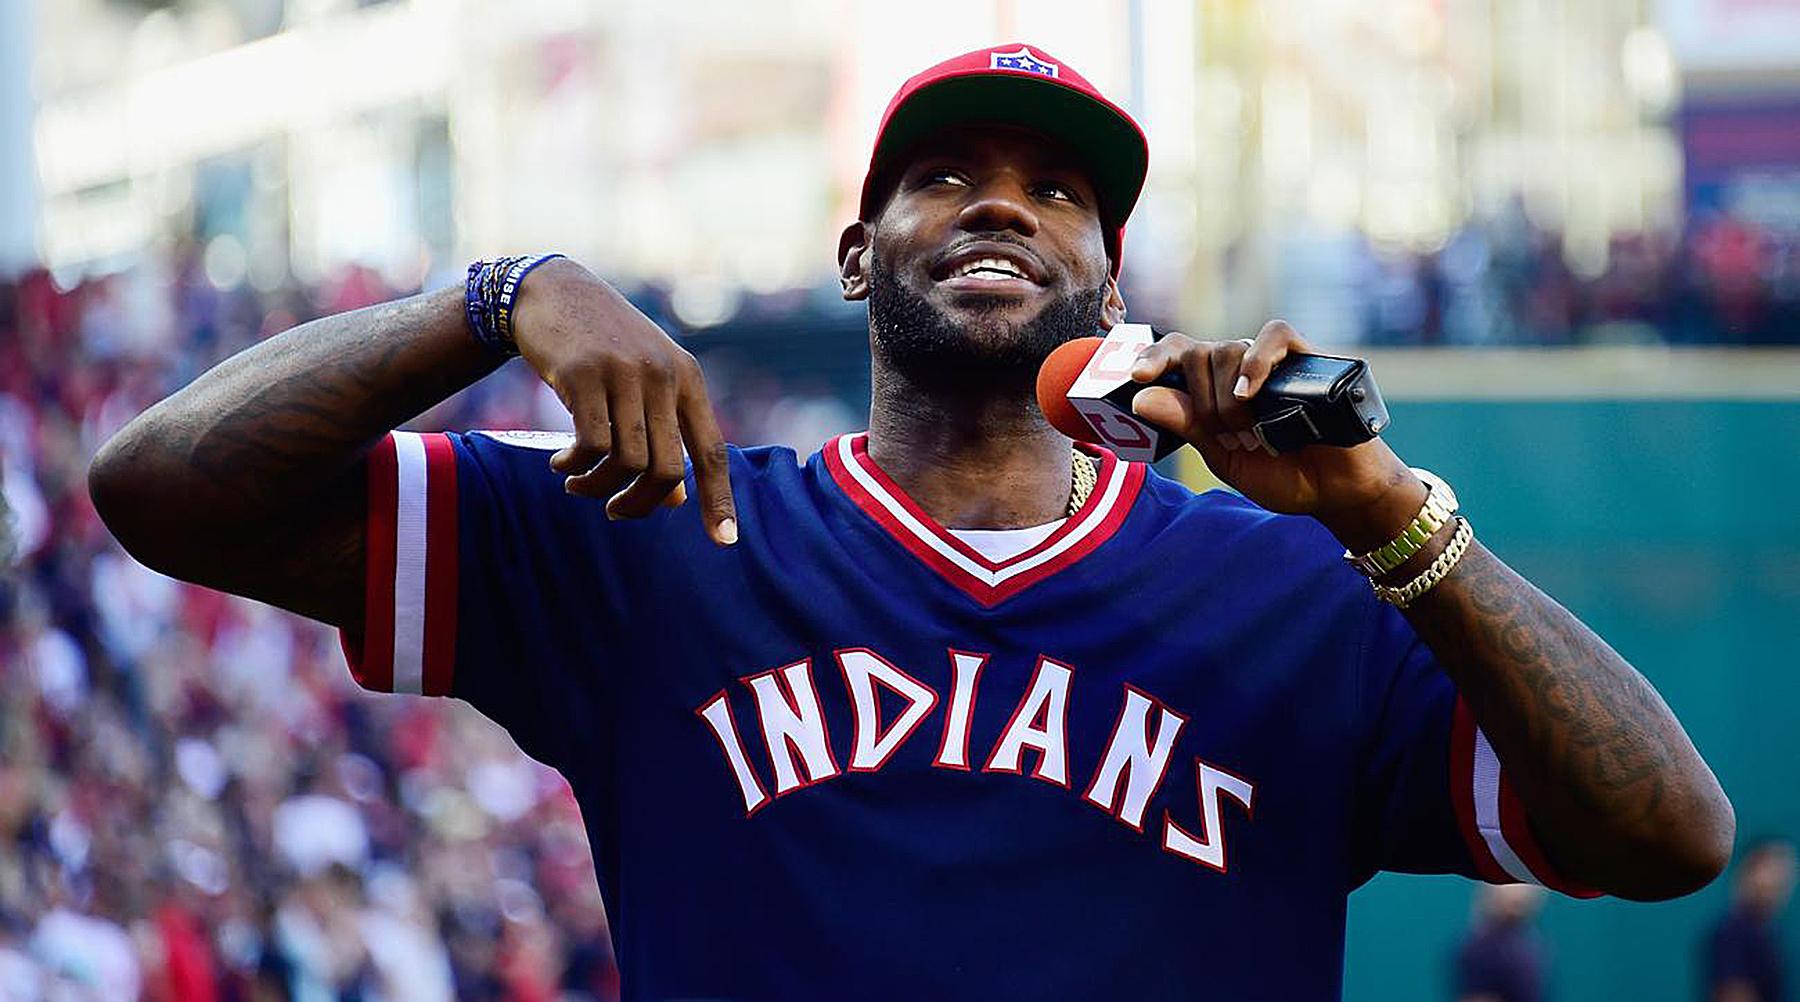 LeBron James Congratulates Indians On World Series Berth